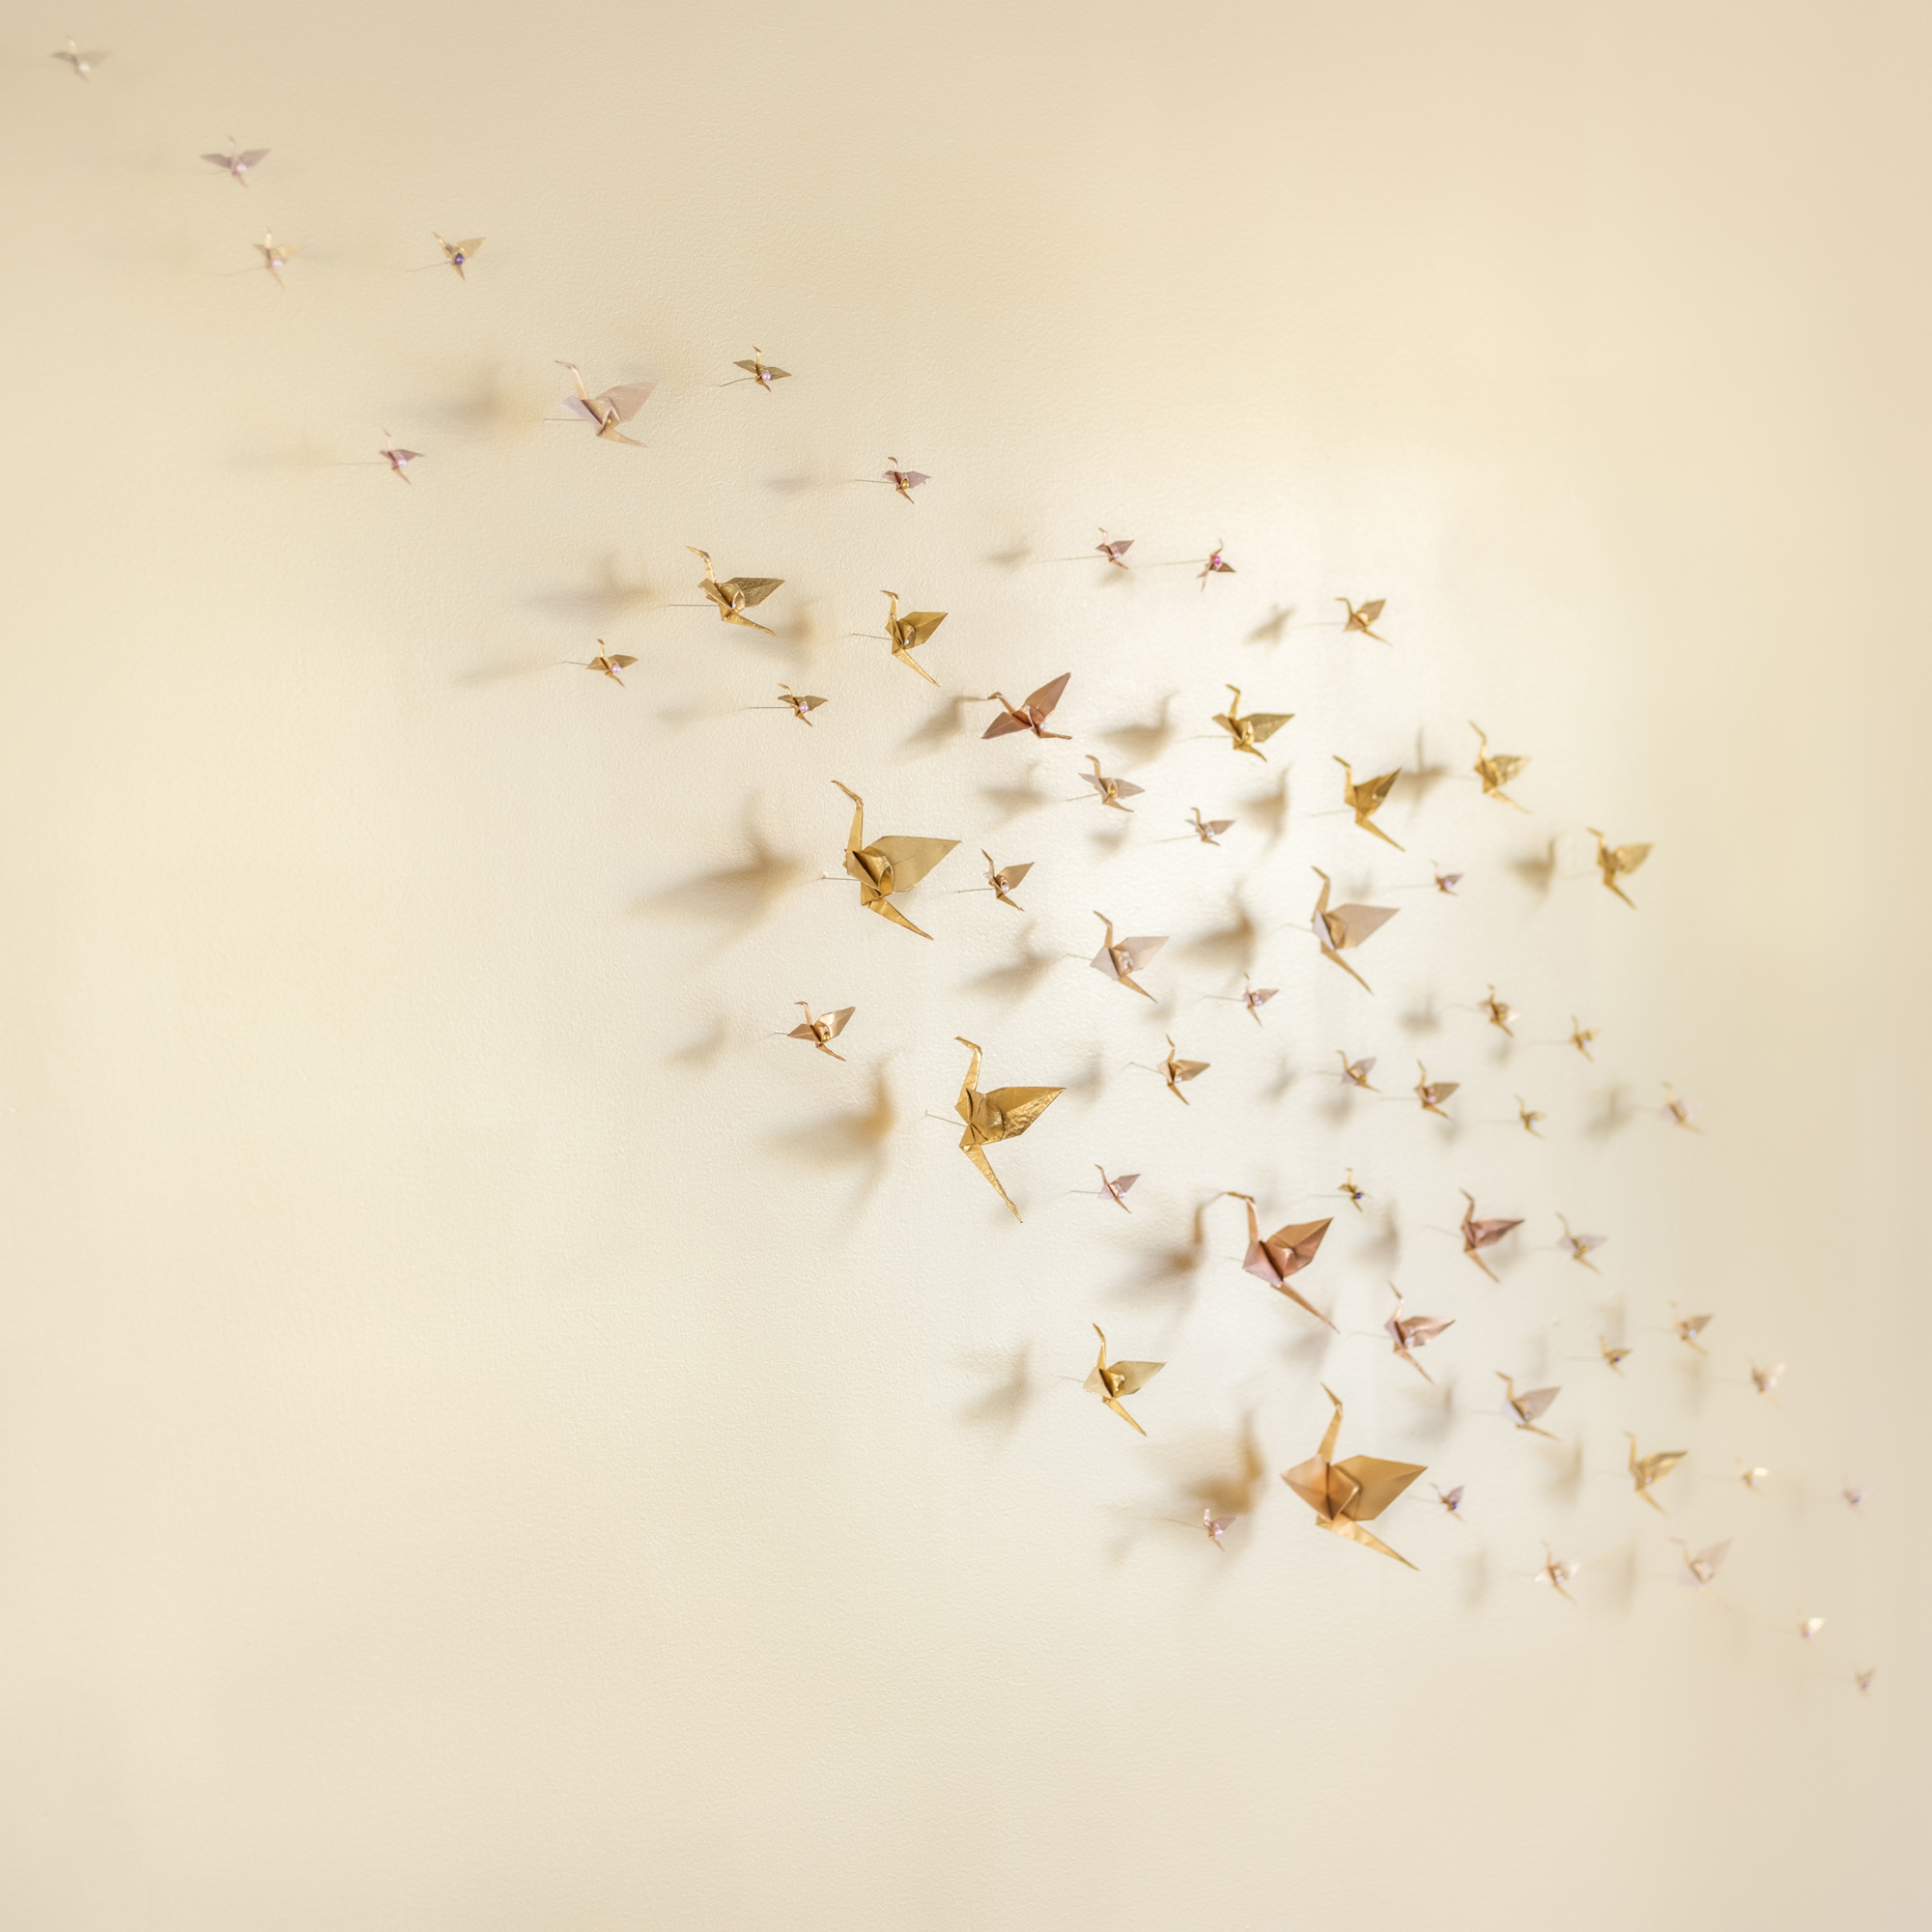 A Siege of Cranes, 2015